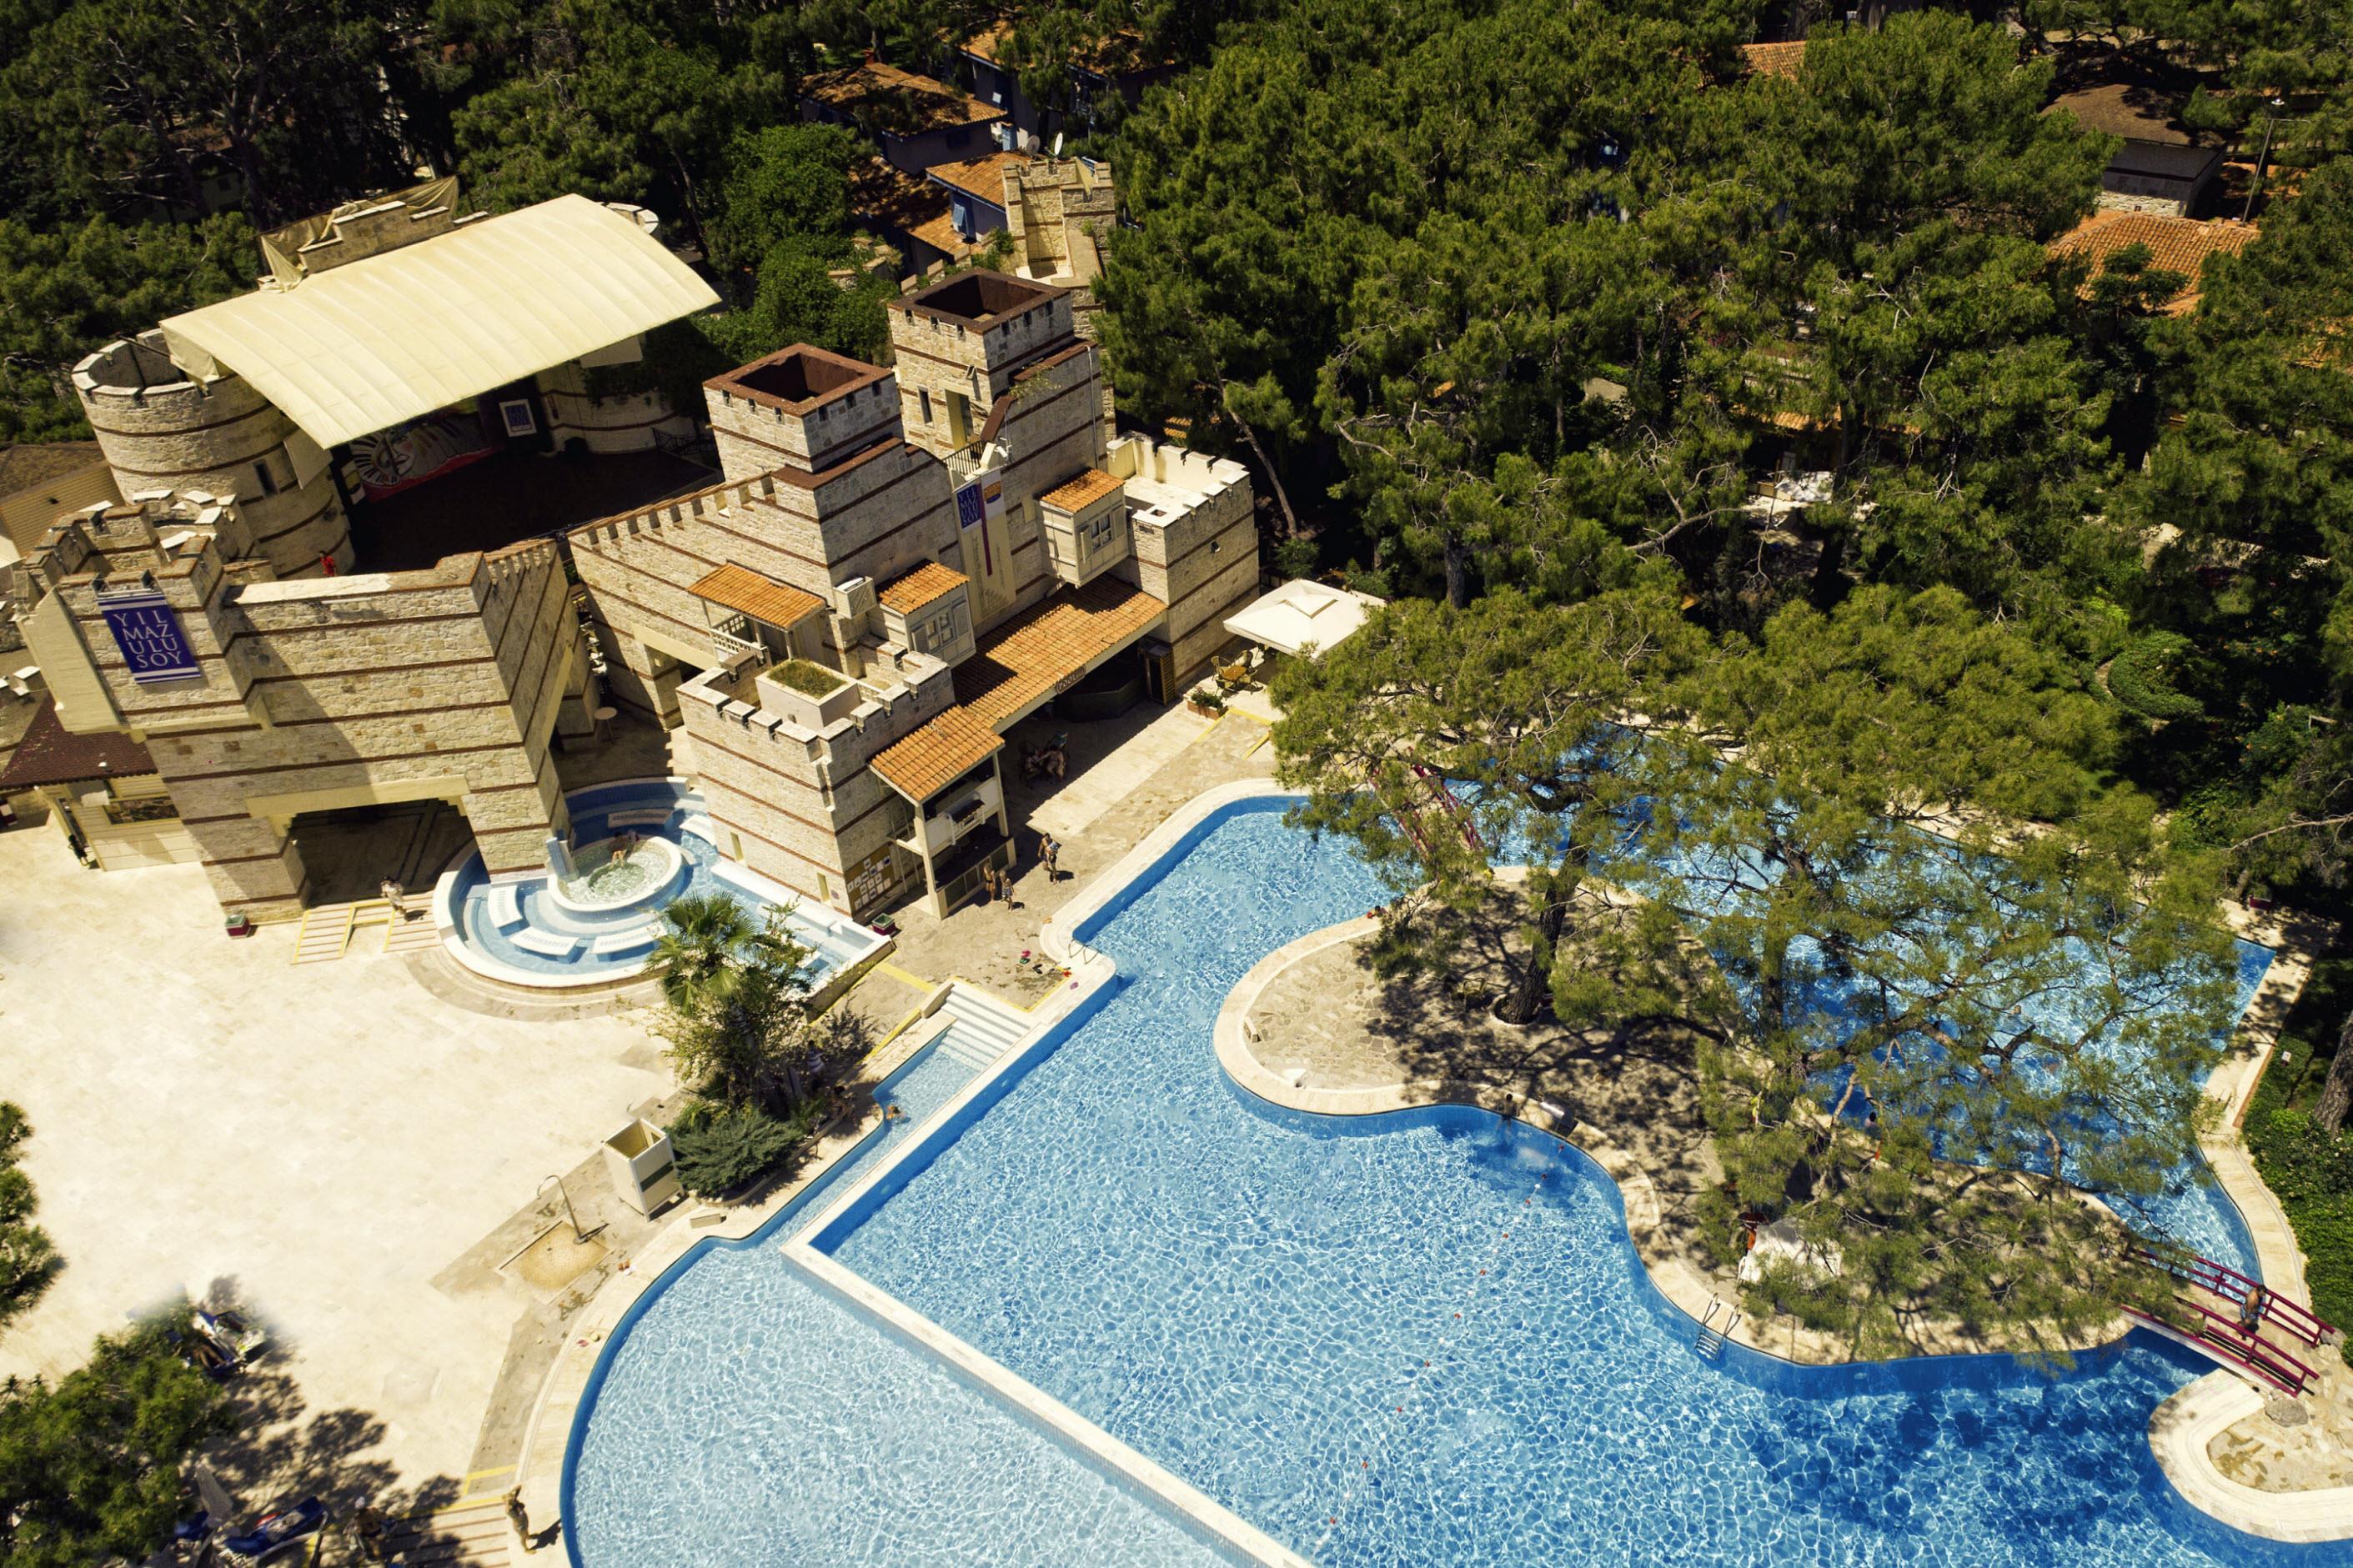 http://www.orextravel.sk/OREX/hotelphotos/ulusoy-kemer-holiday-club-area-0027.jpg